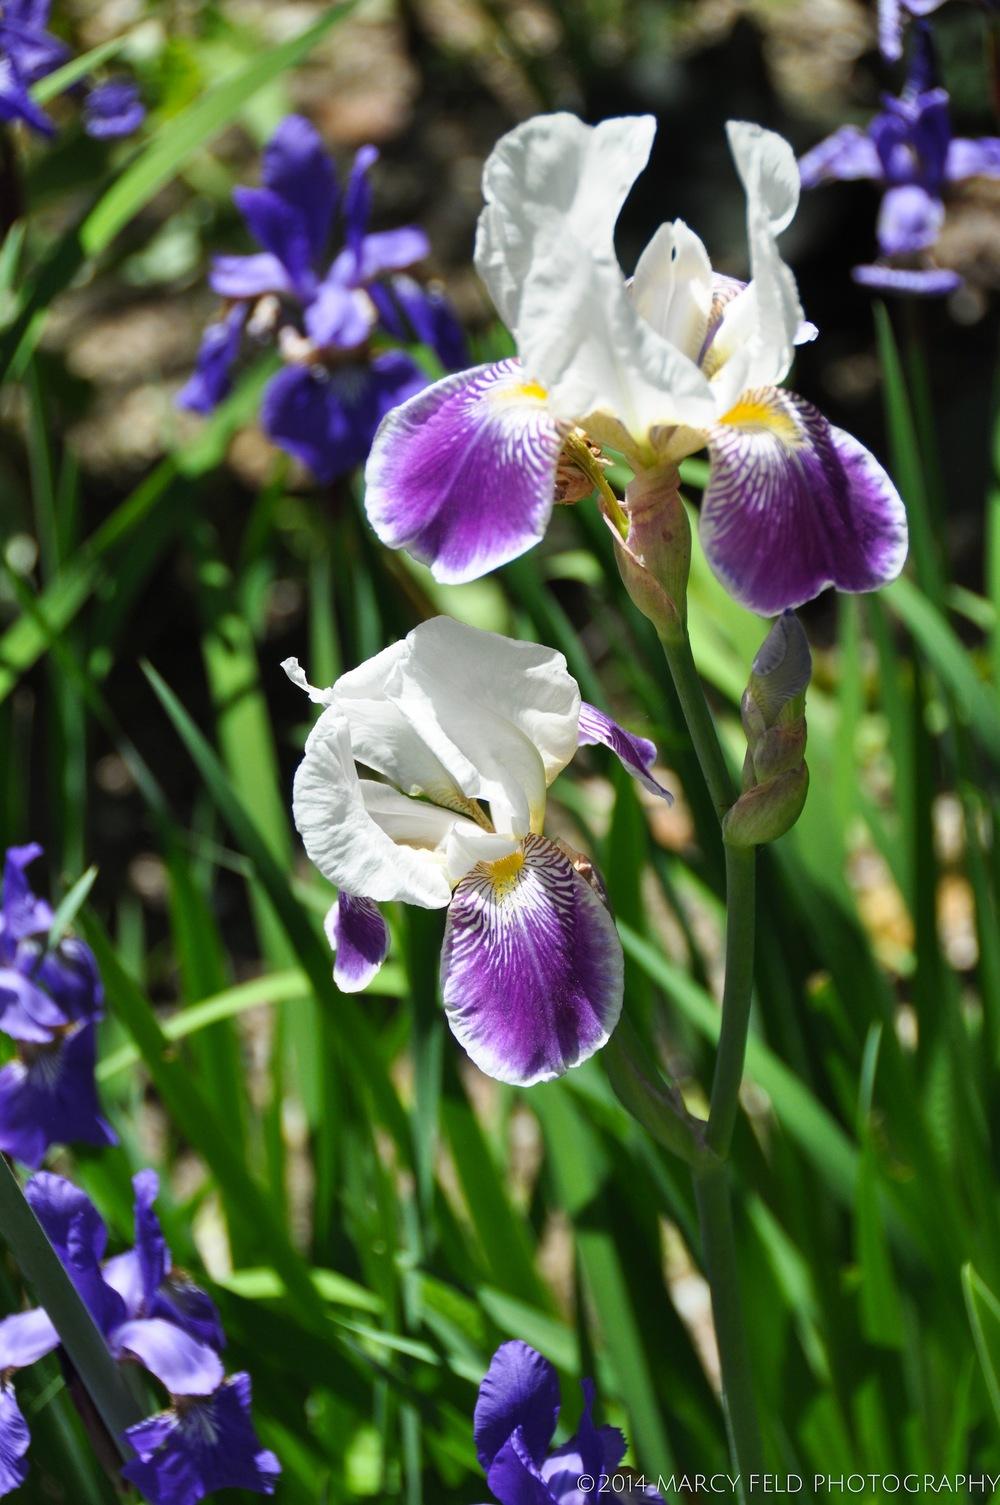 Little White Tiger Iris